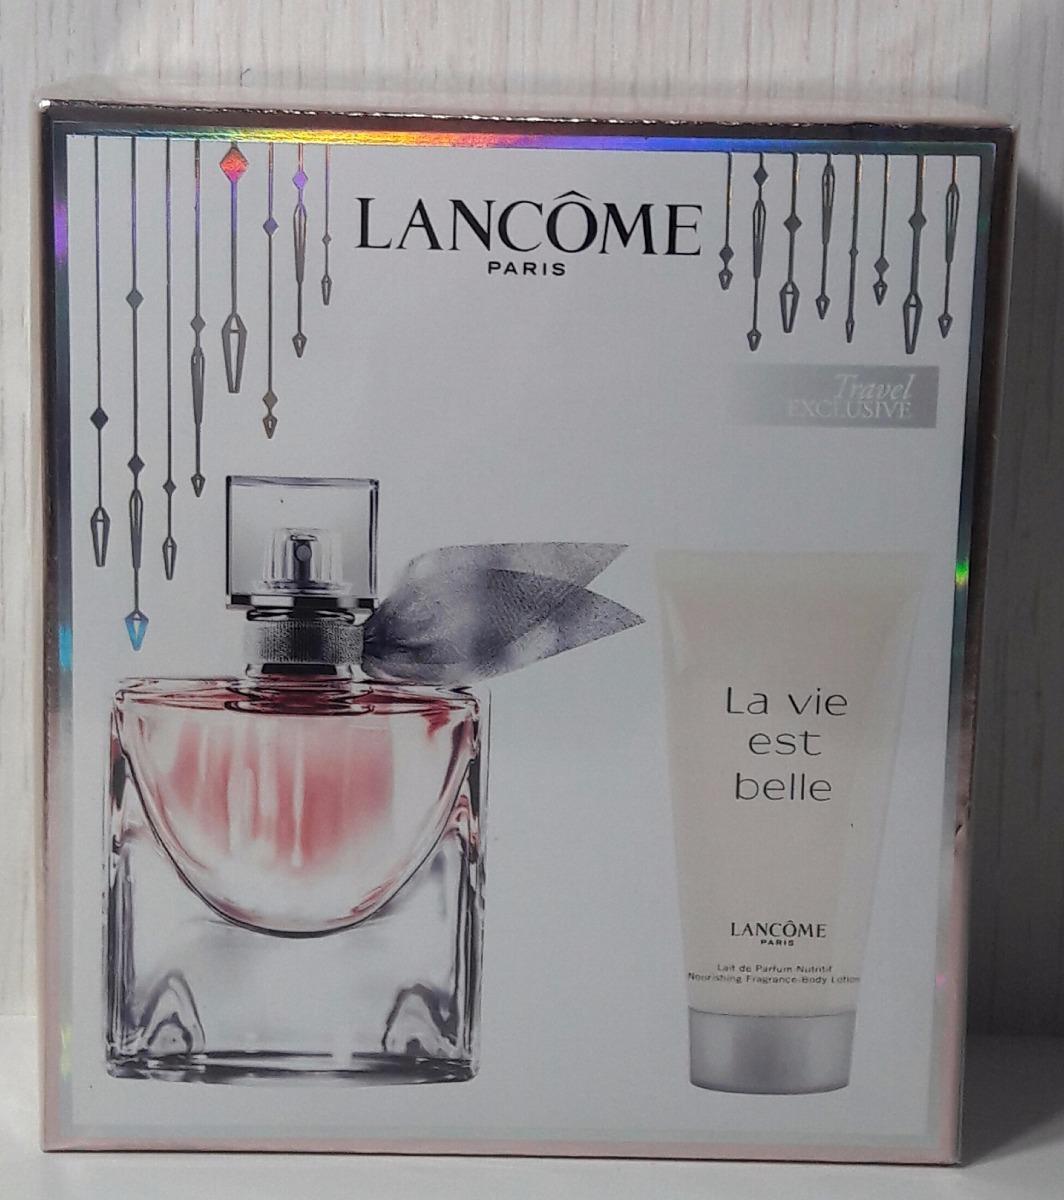 babbaa90b6 kit lancôme la vie est belle eau de parfum 50 ml original. Carregando zoom.